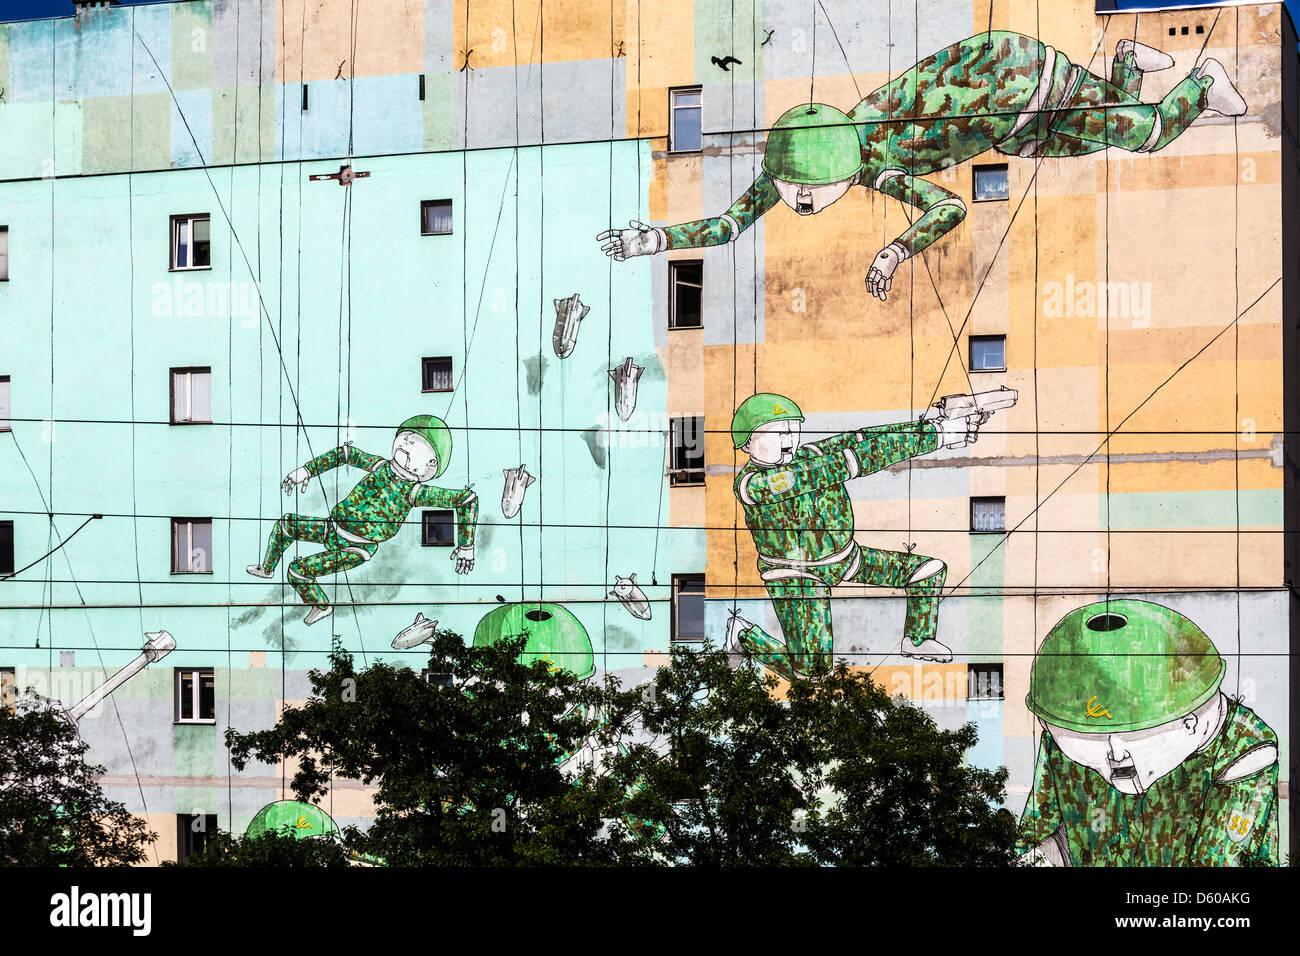 Parte di un anti-guerra murale di artista italiano Blu a Varsavia in Polonia. Immagini Stock